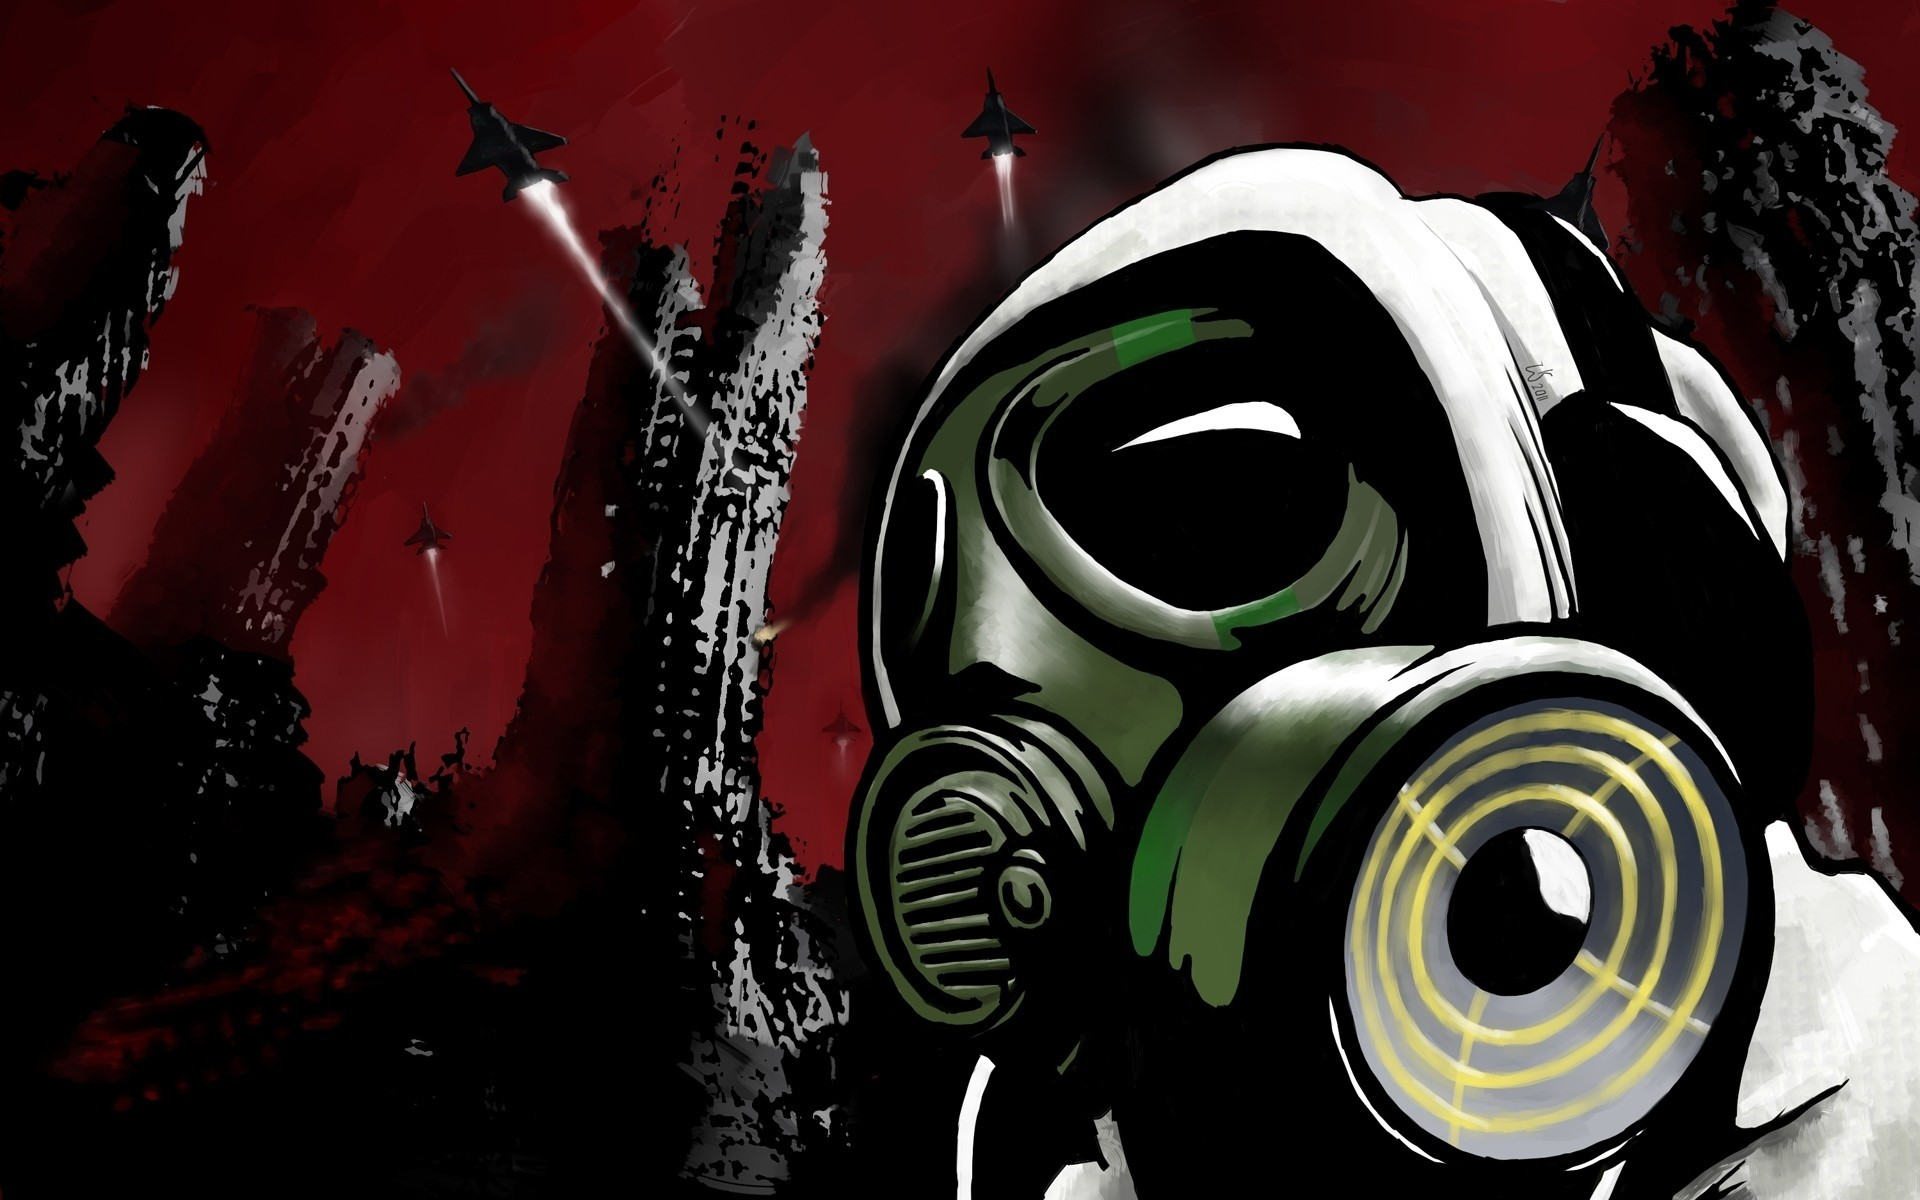 46+ Anime Gas Mask Wallpaper on WallpaperSafari